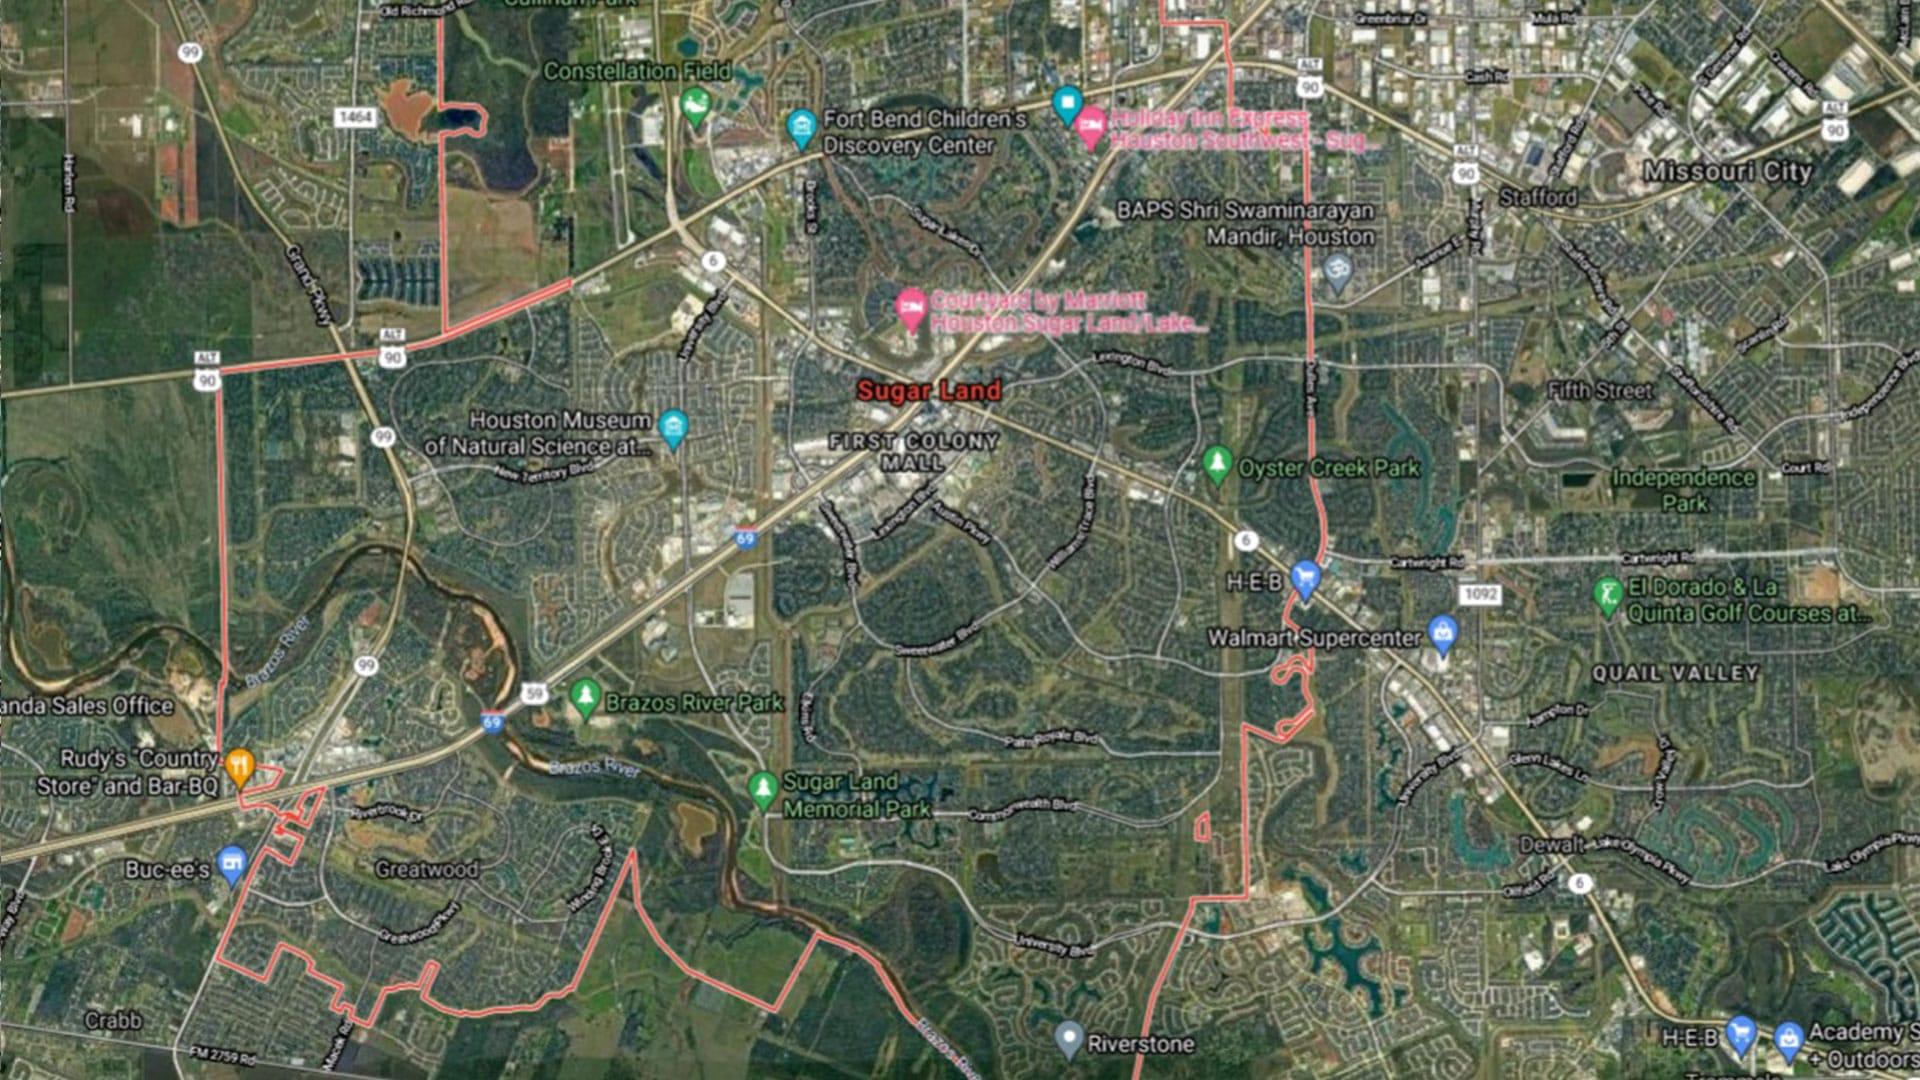 West-Houston-Neighborhood---SUGAR-LAND